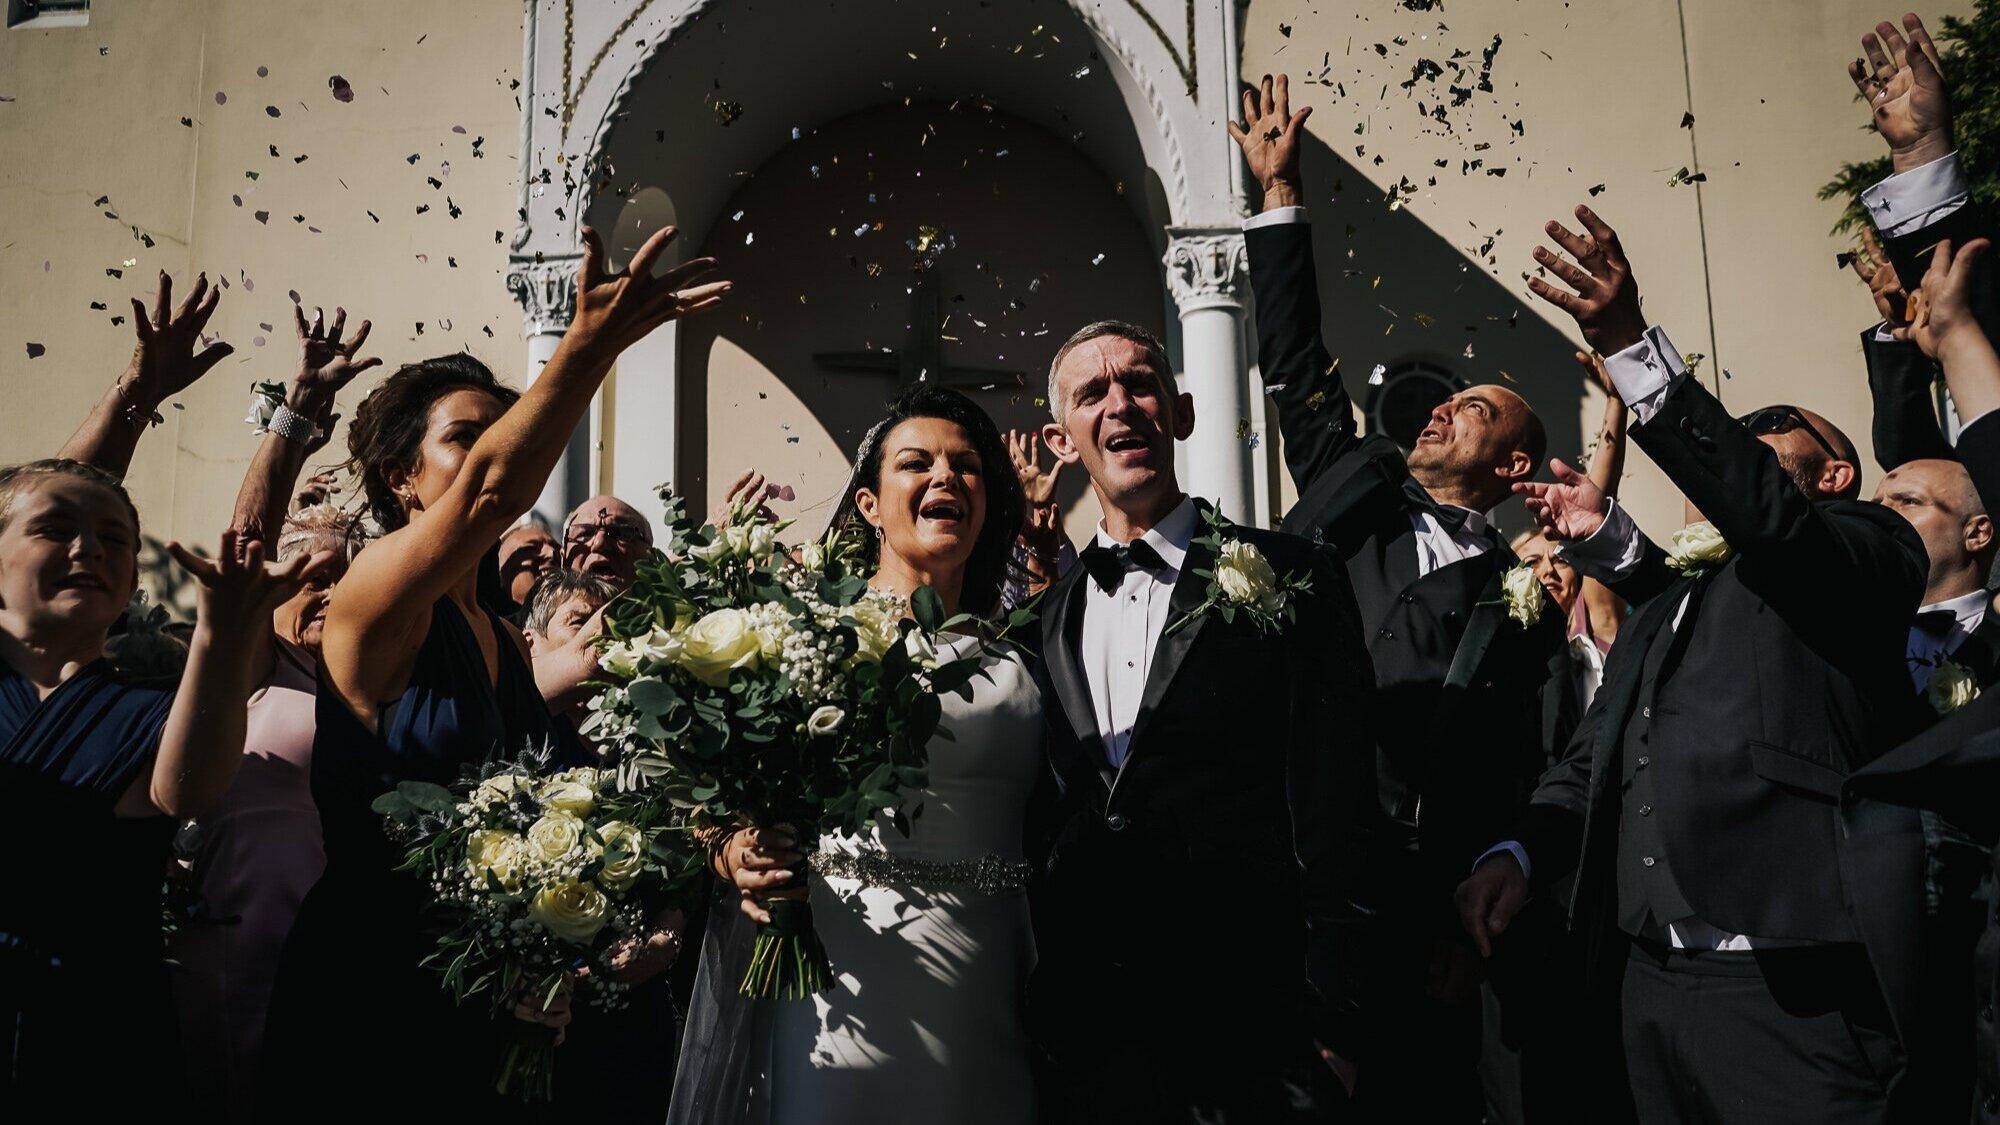 Clontarf+Caste+wedding+photographer+Wedding+Photography+dublin+ireland+wedding+photographer+%2833+of+58%29.jpg